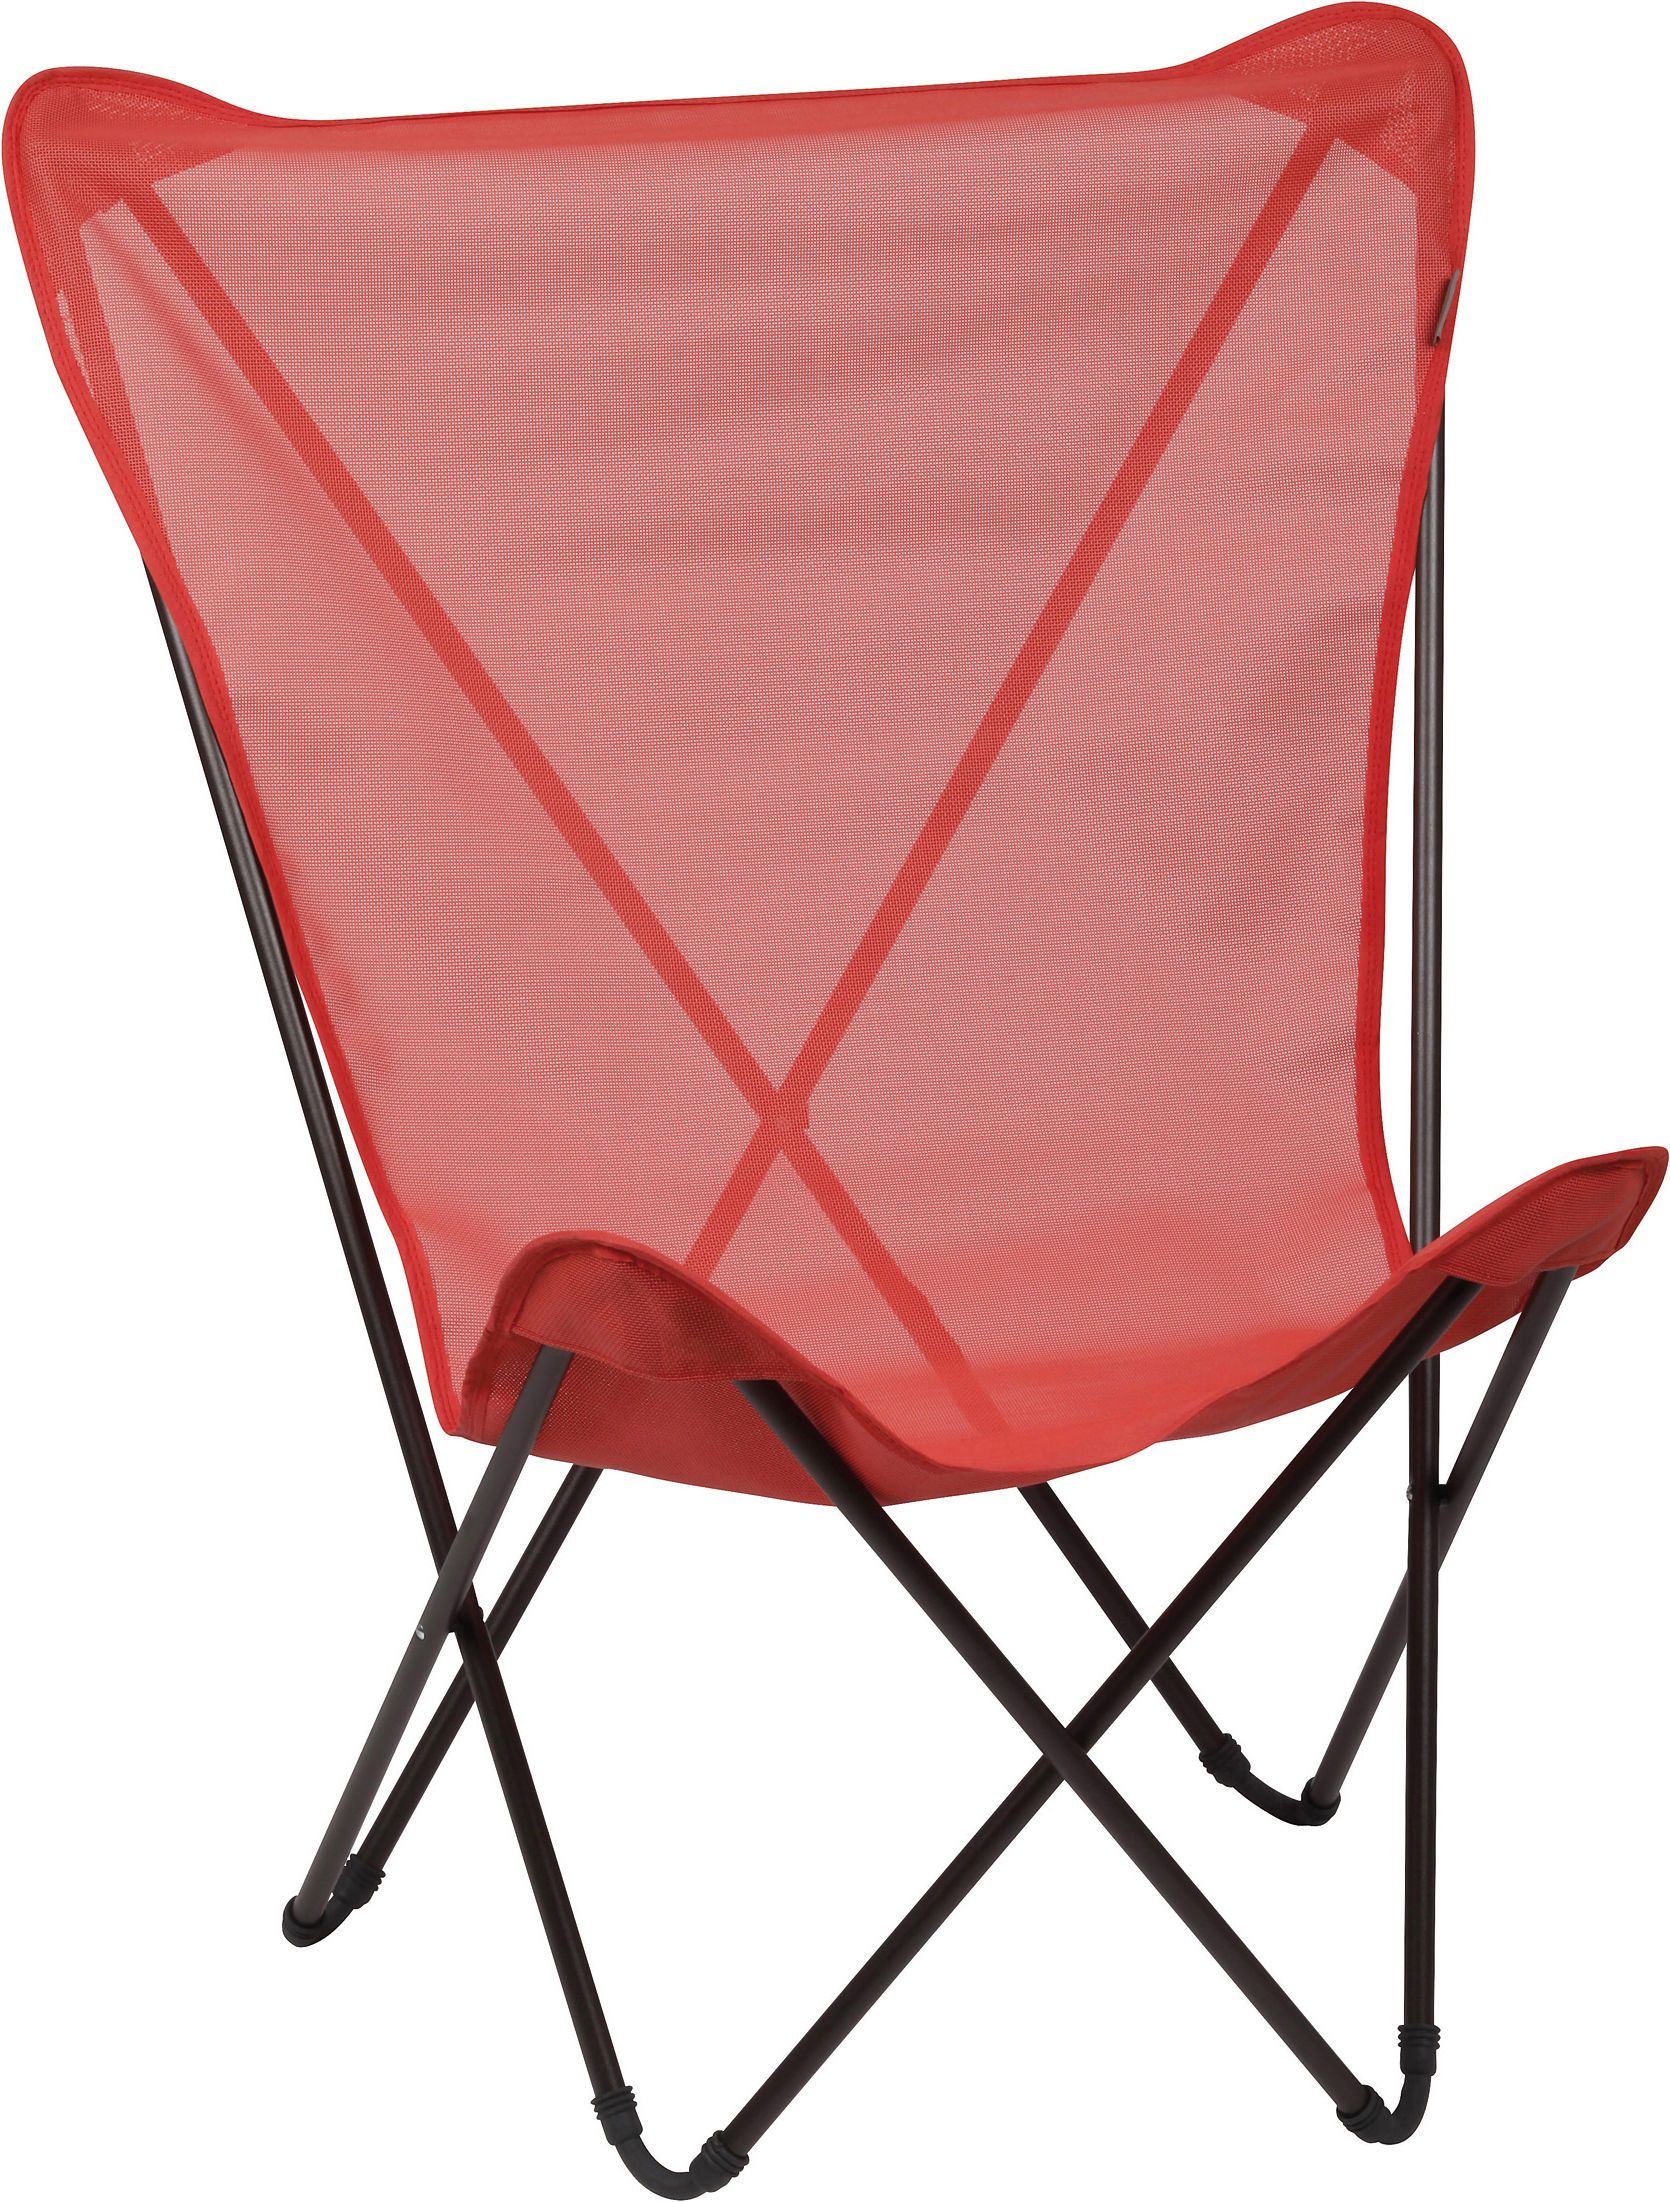 fauteuil maxi pop up pliable rouge aurore structure marron lafuma. Black Bedroom Furniture Sets. Home Design Ideas